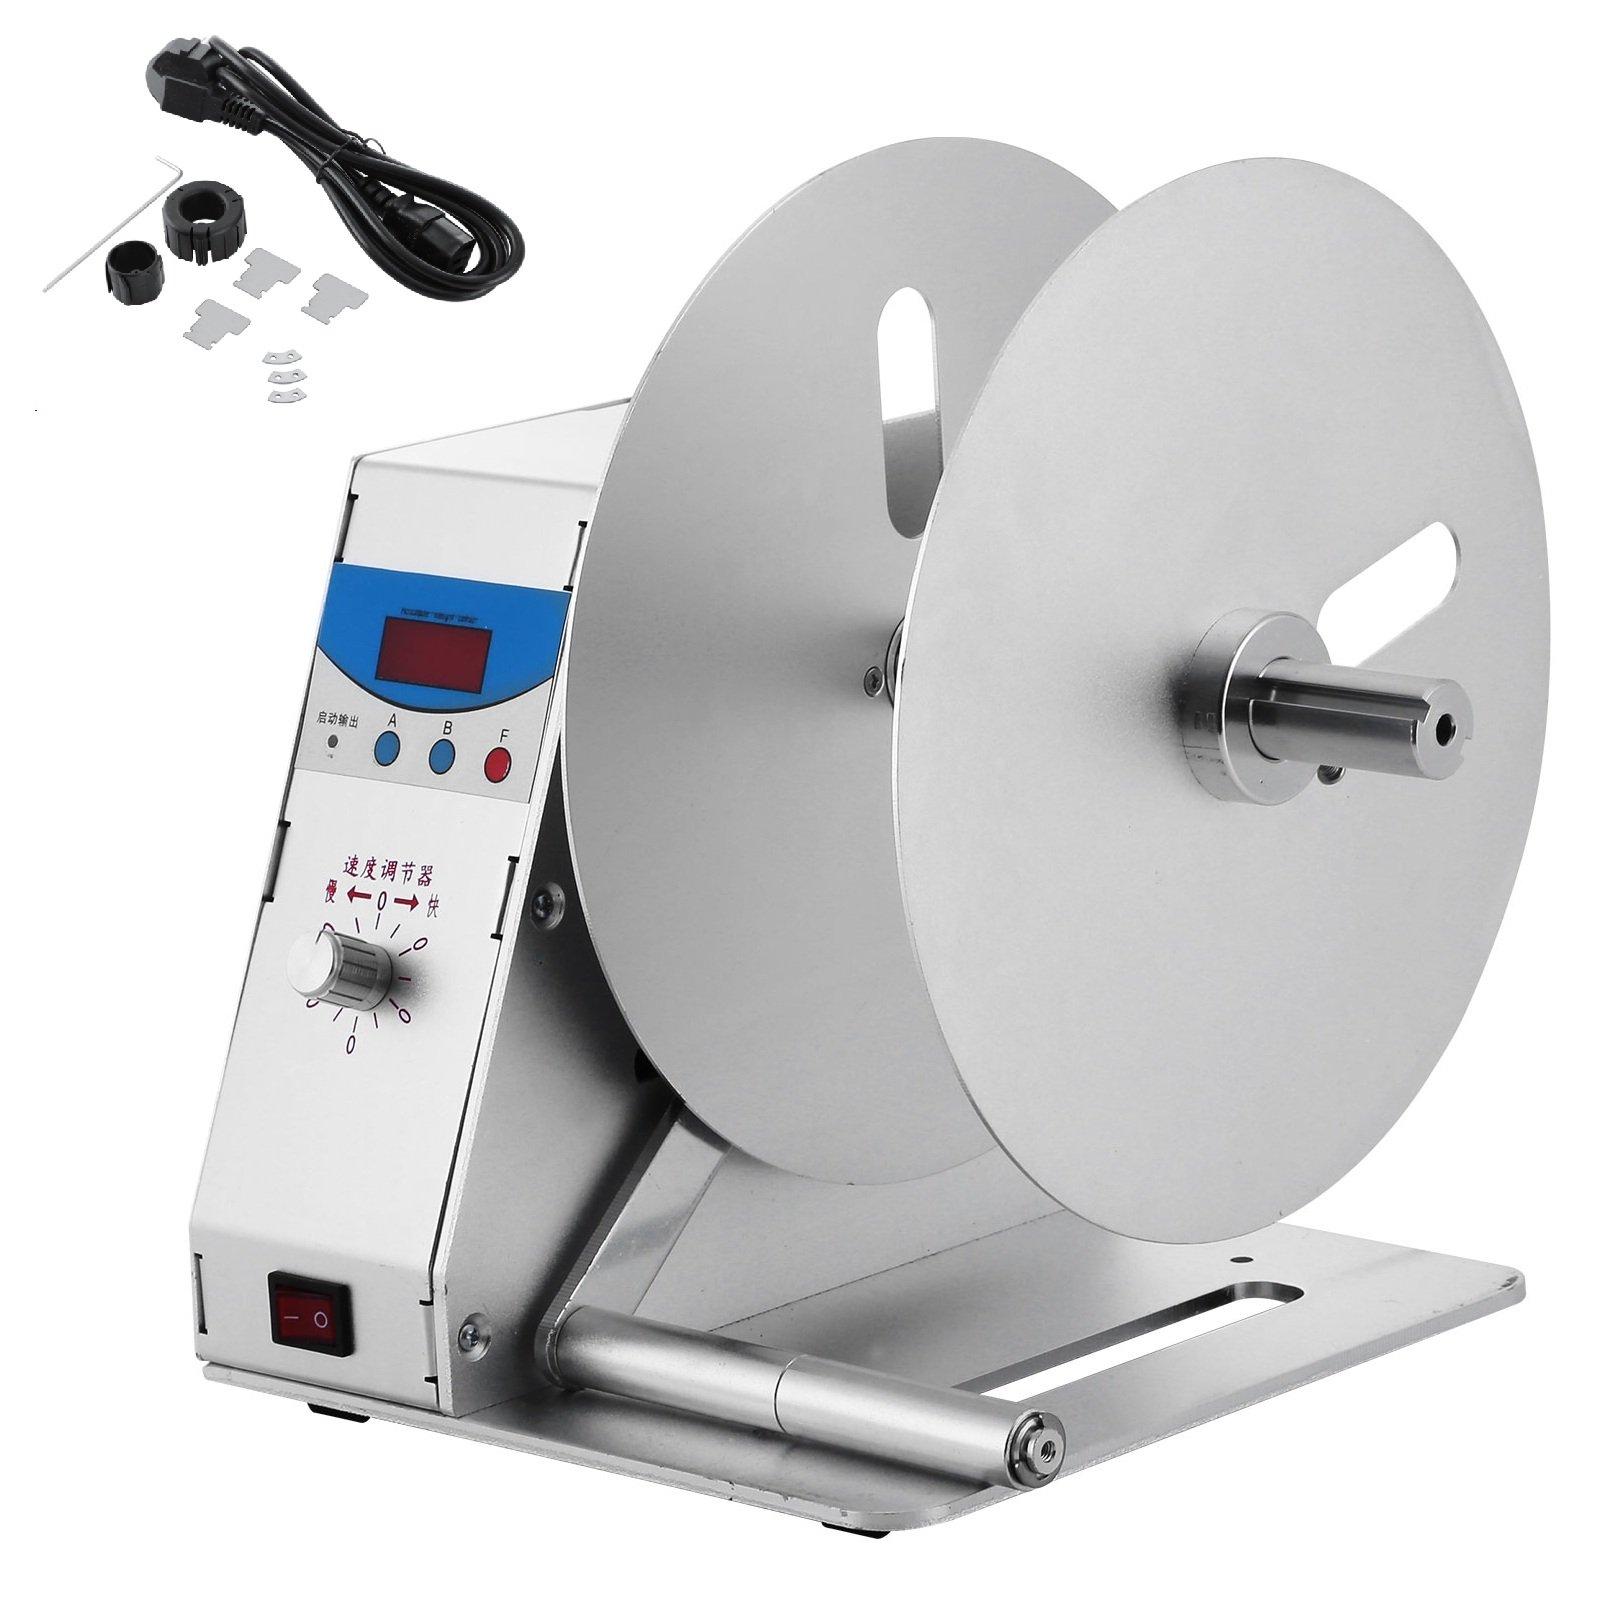 Superland Label Rewinder Machine 0~50r/min Adjustable Speed Automatic Label Rewinding Machine 110V Digital Tags Rewinder for Office Industrial Warehouse Production Line (Automatic Label Rewinder)